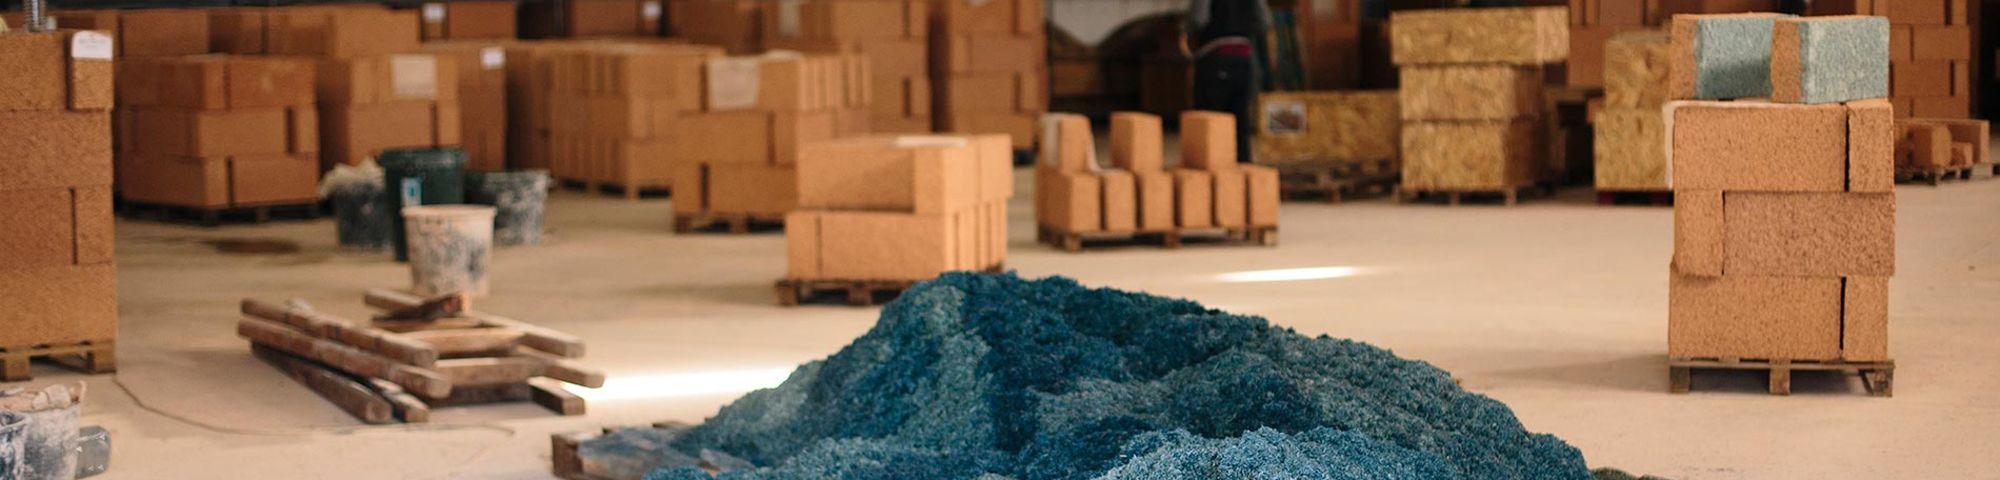 Blue material i pile